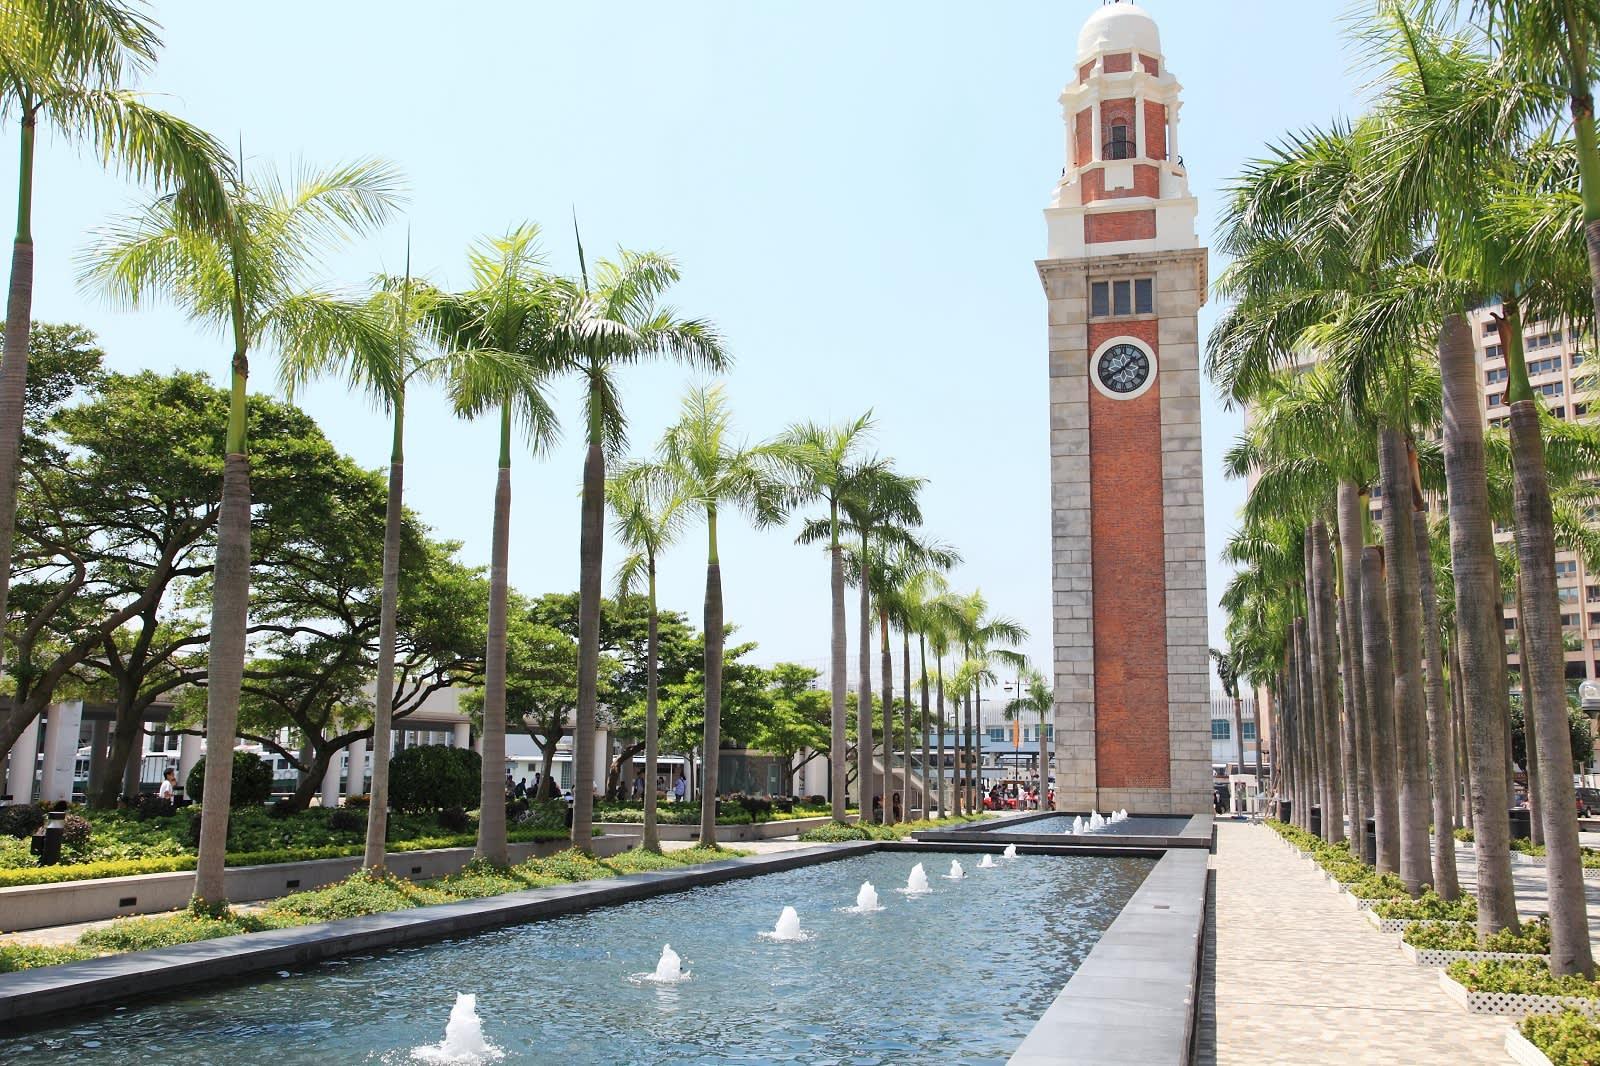 The historic clock tower in Tsim Sha Tsui designed by English architect Arthur Benison Hubback during World War I.